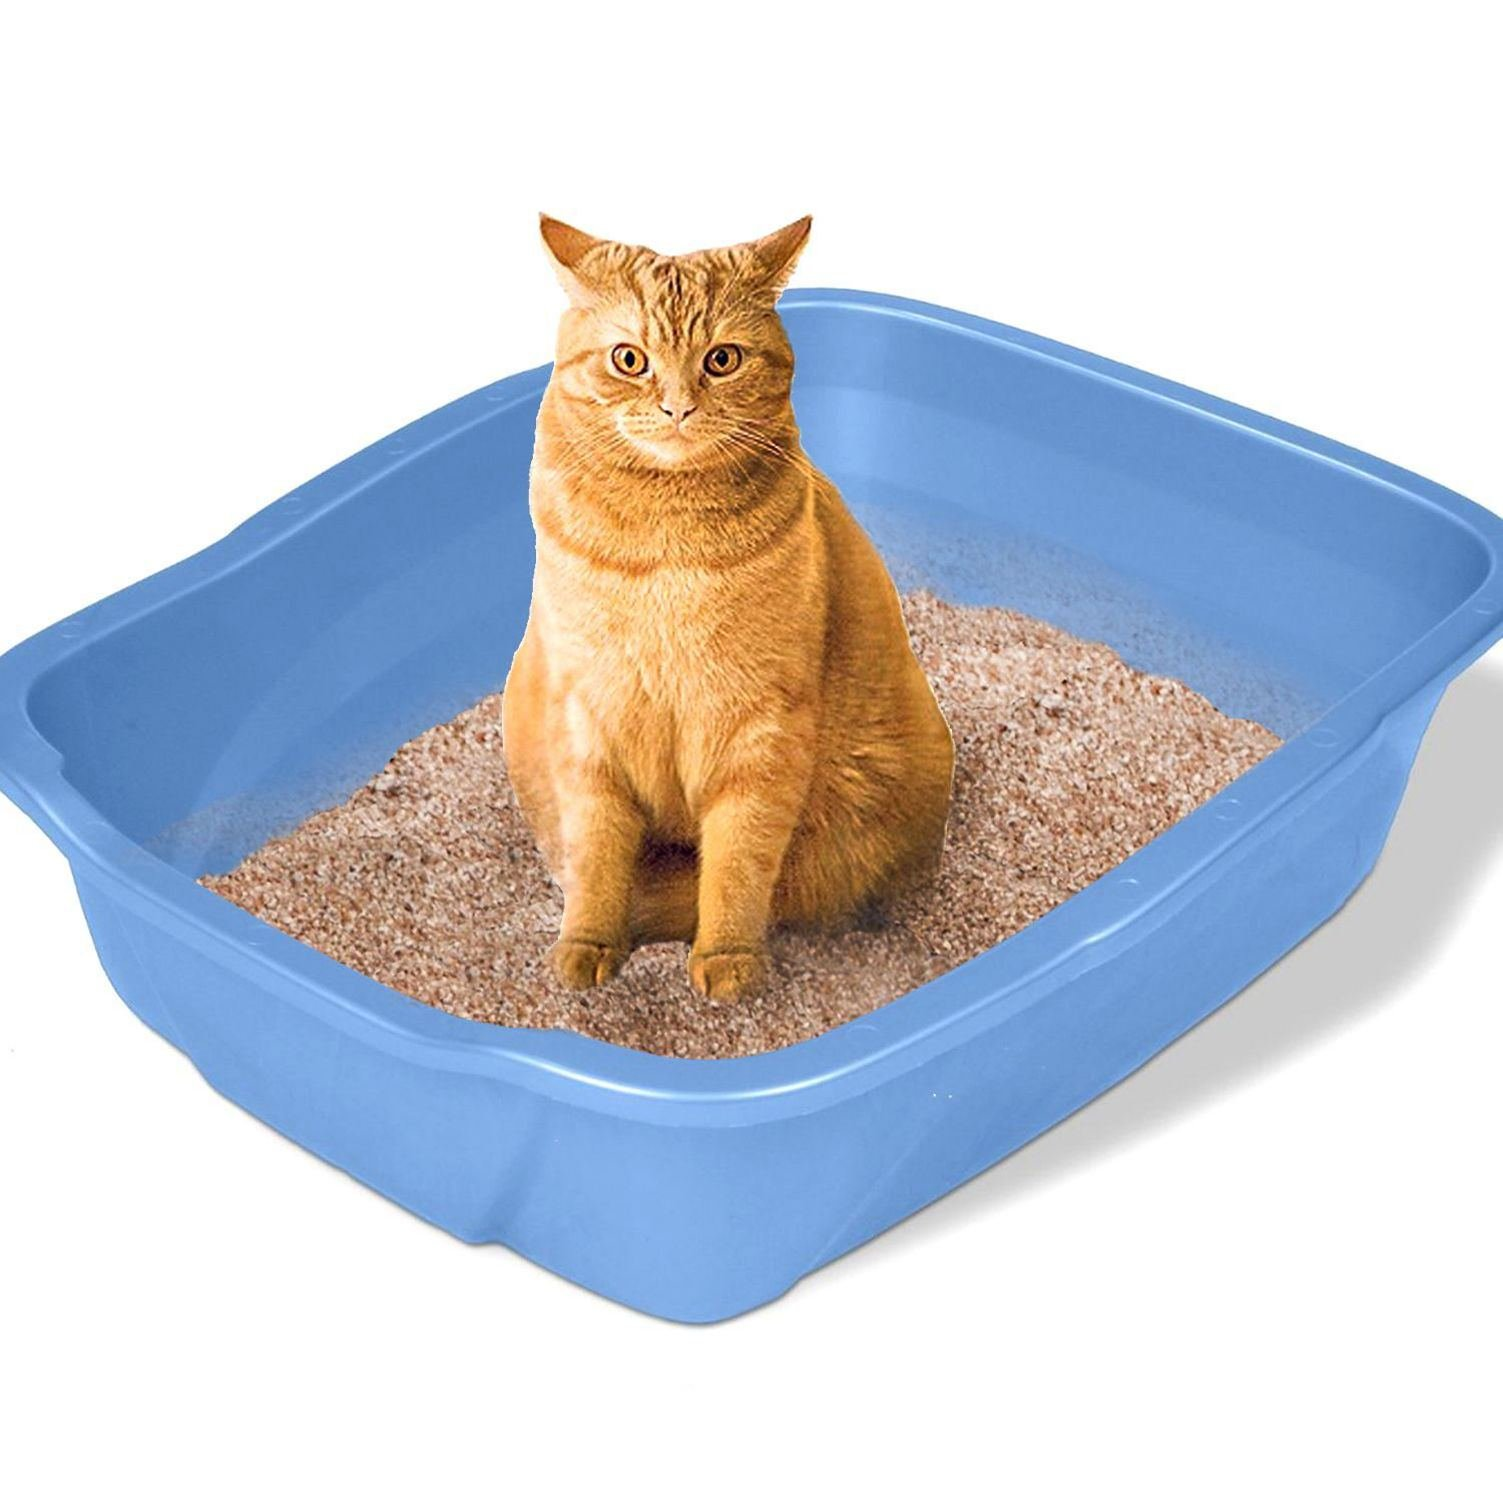 Large Cat Litter Box Big Kitty Pan Huge Pet Toilet Clean Mat House Furniture :New